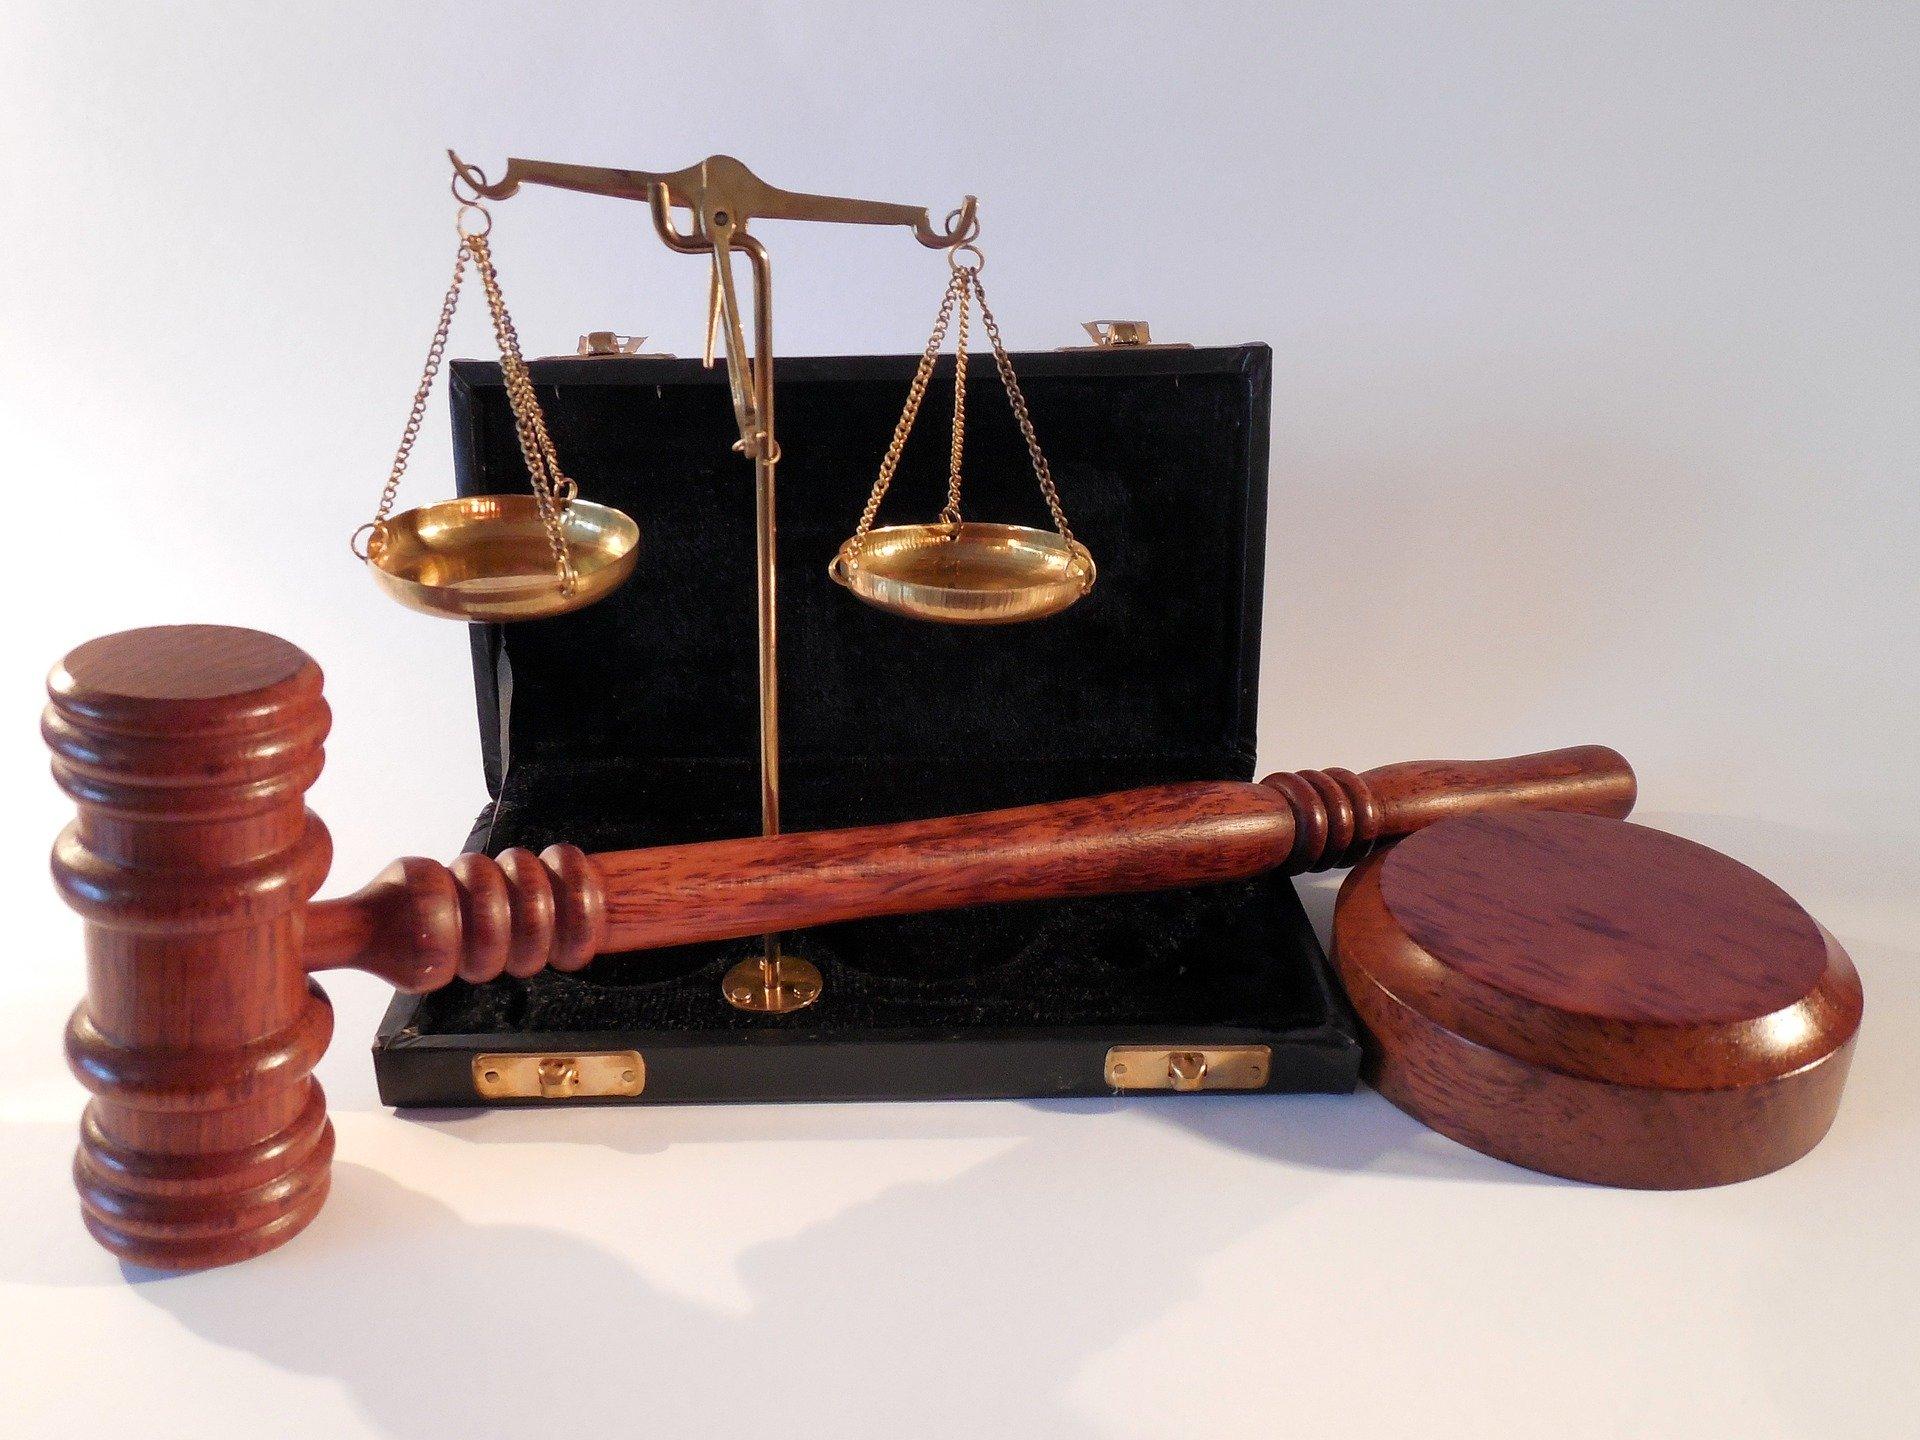 Familienrecht – Privatrecht oder Zivilrecht? 1